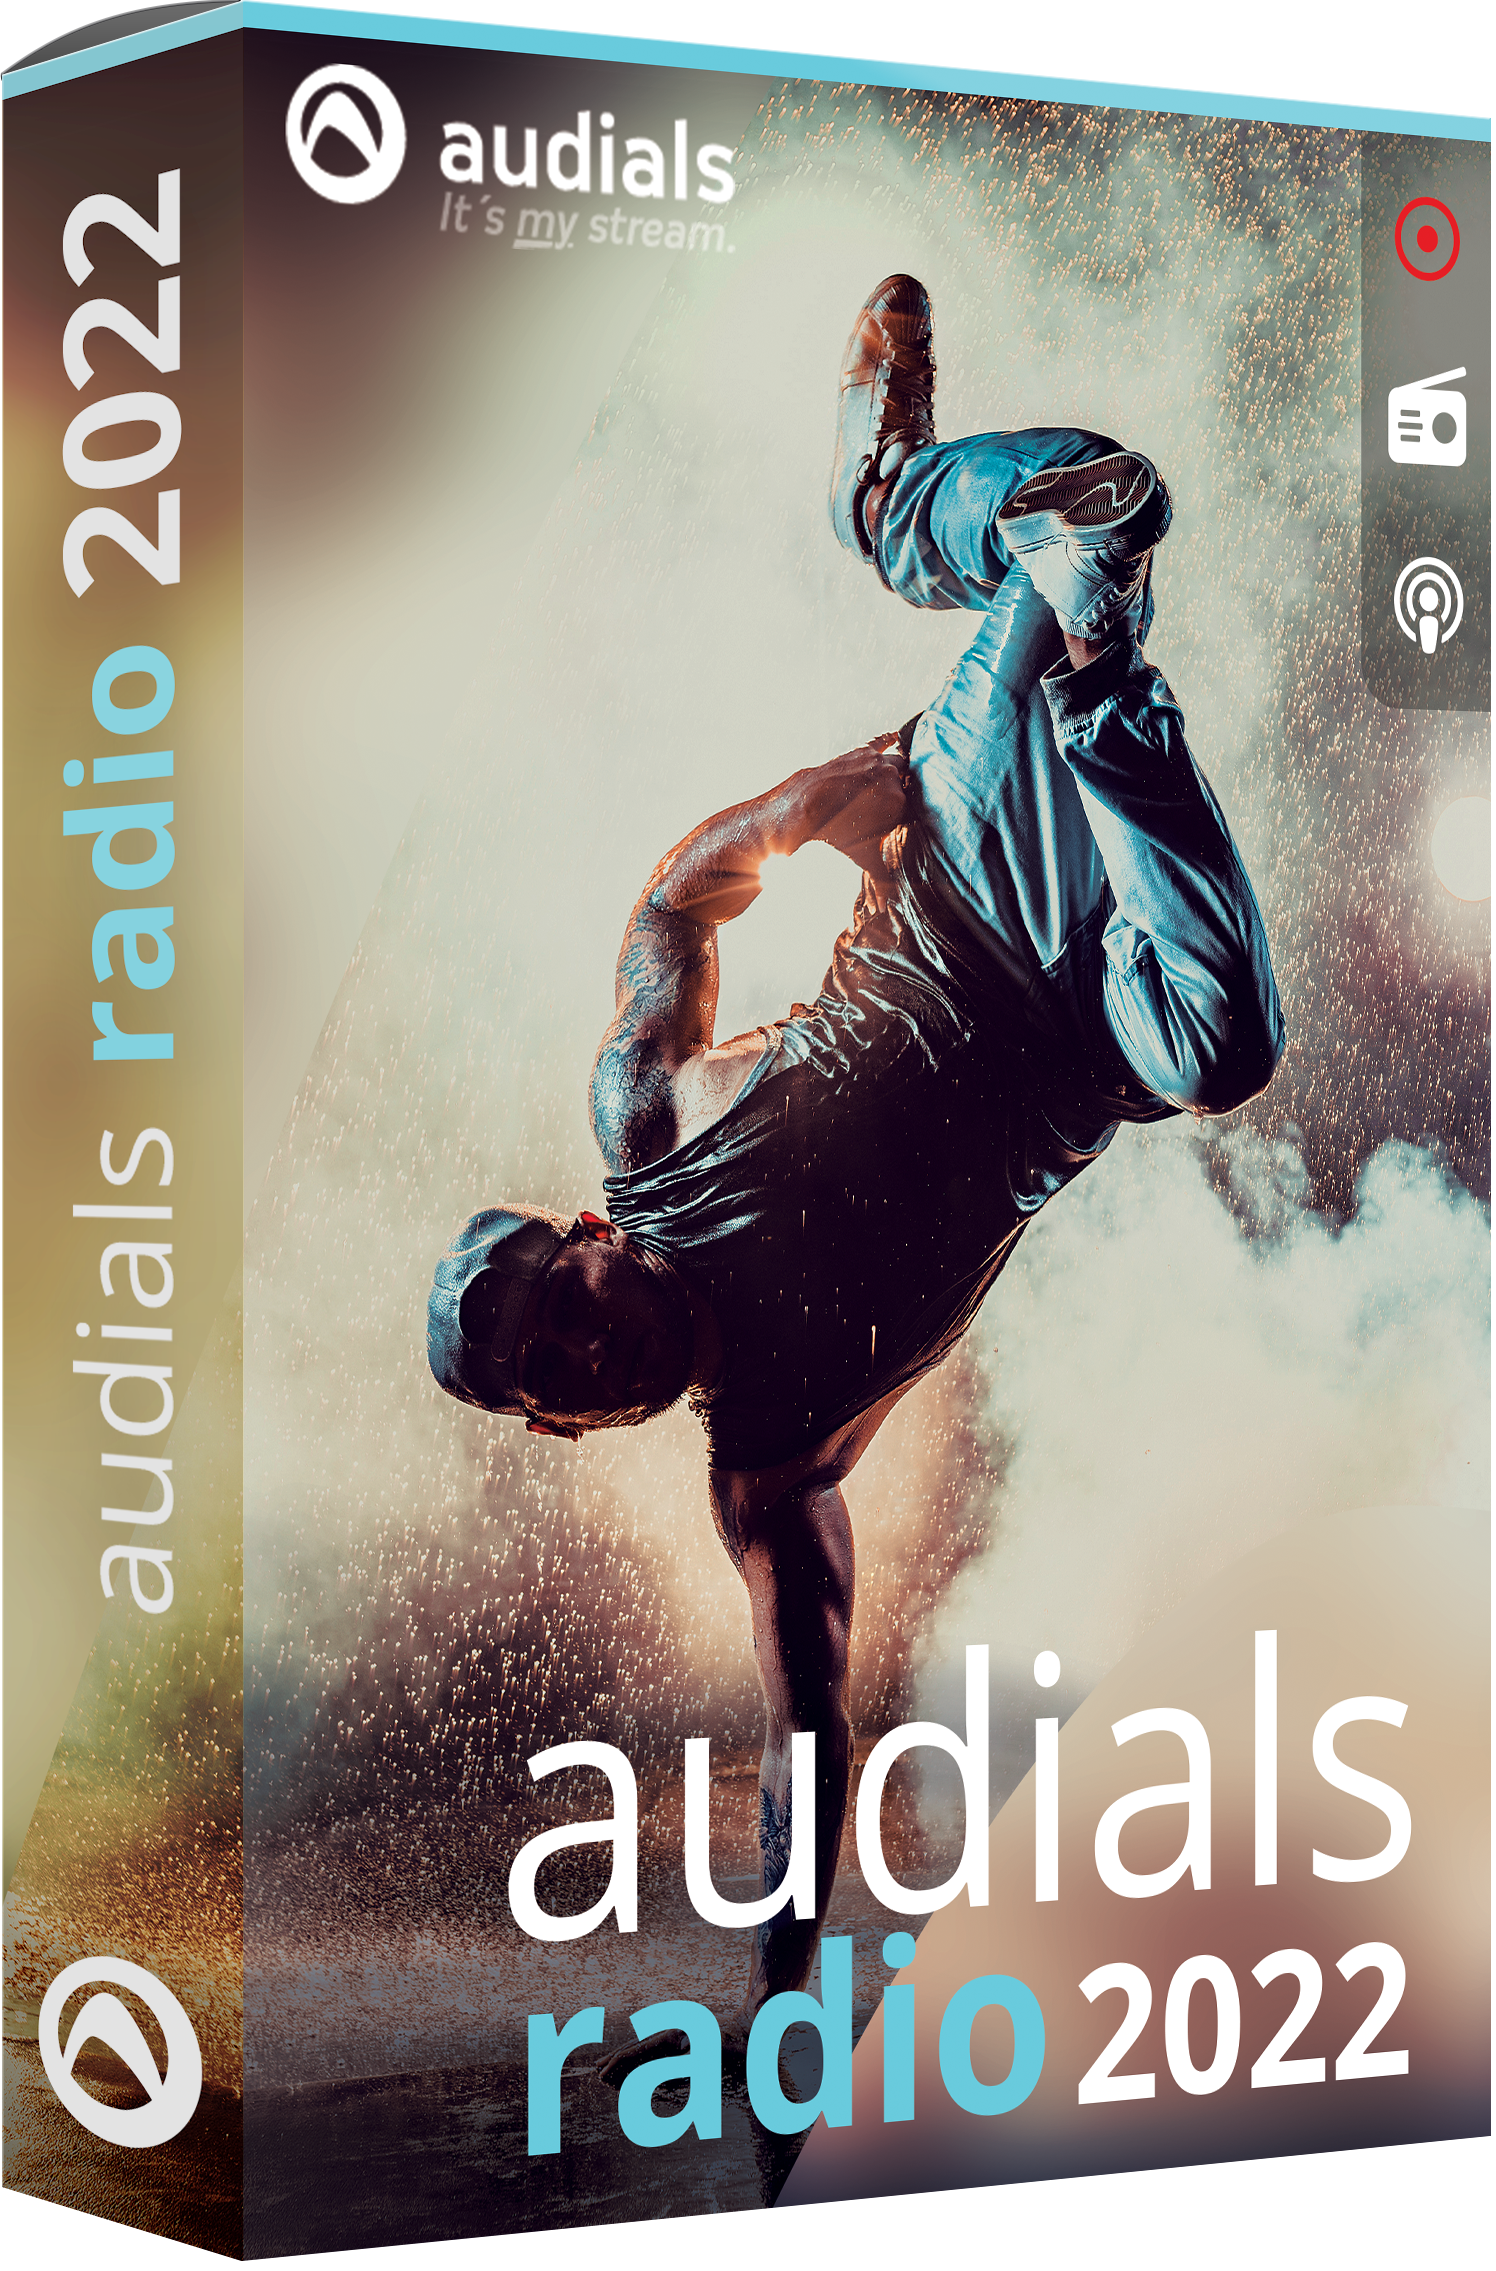 Audials Radio 2022